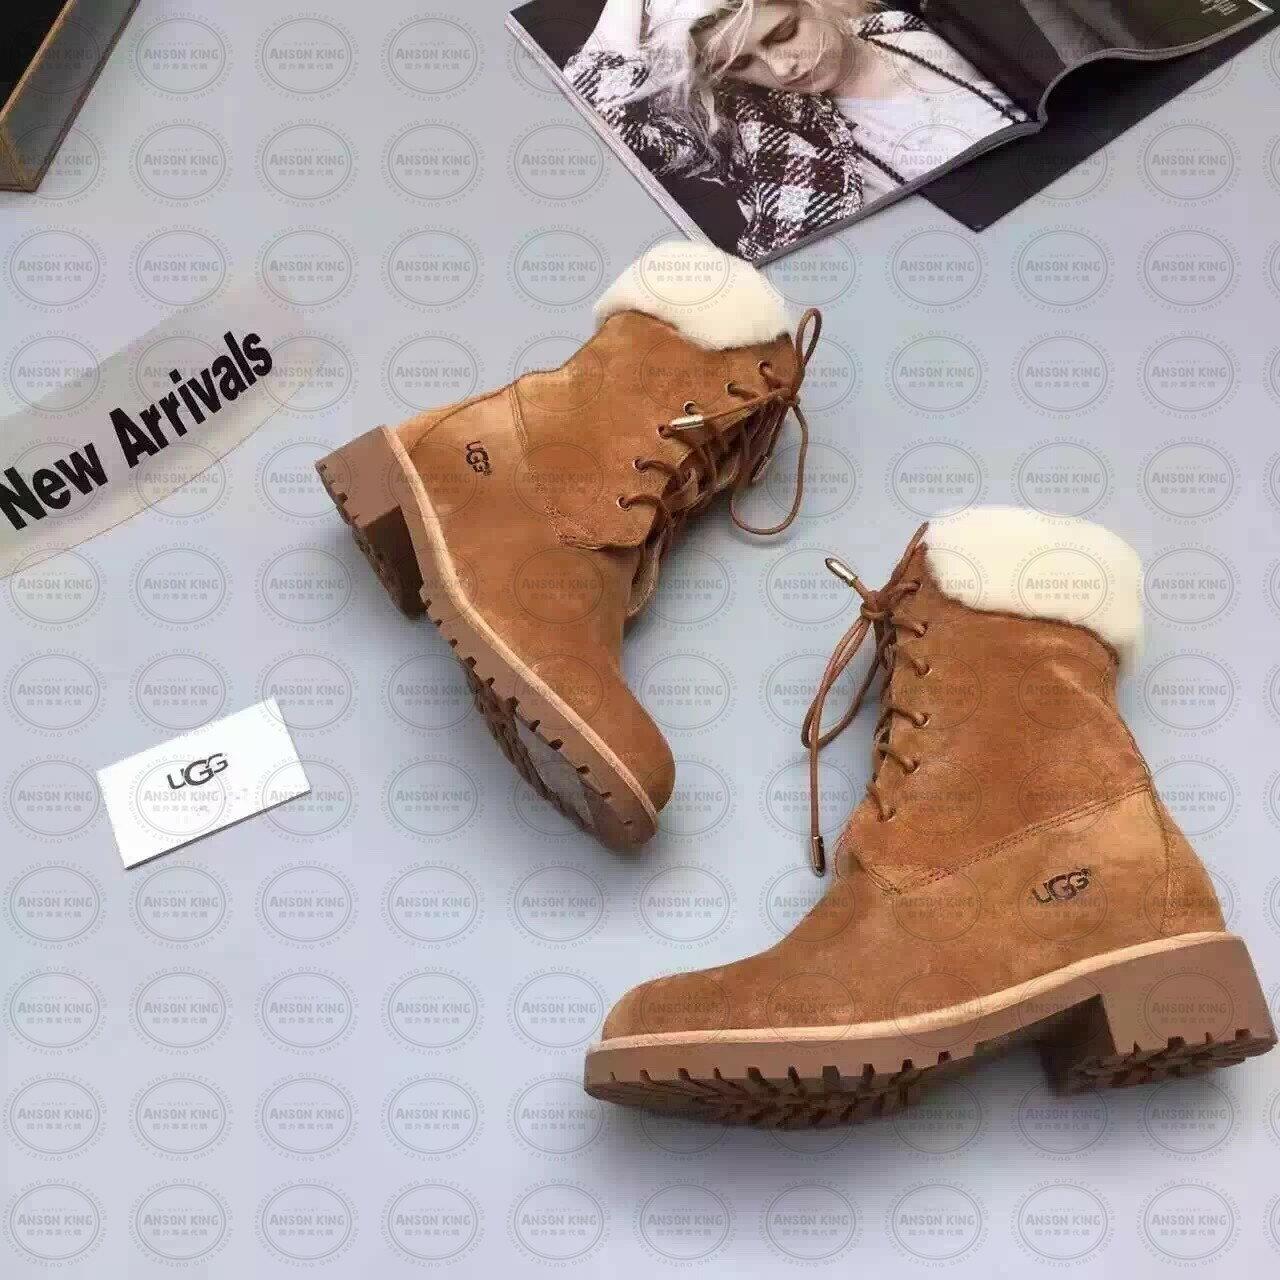 OUTLET正品代購 澳洲 UGG 女款經典復古翻毛 馬汀靴 中長靴 保暖 真皮羊皮毛 雪靴 短靴 棕色 2